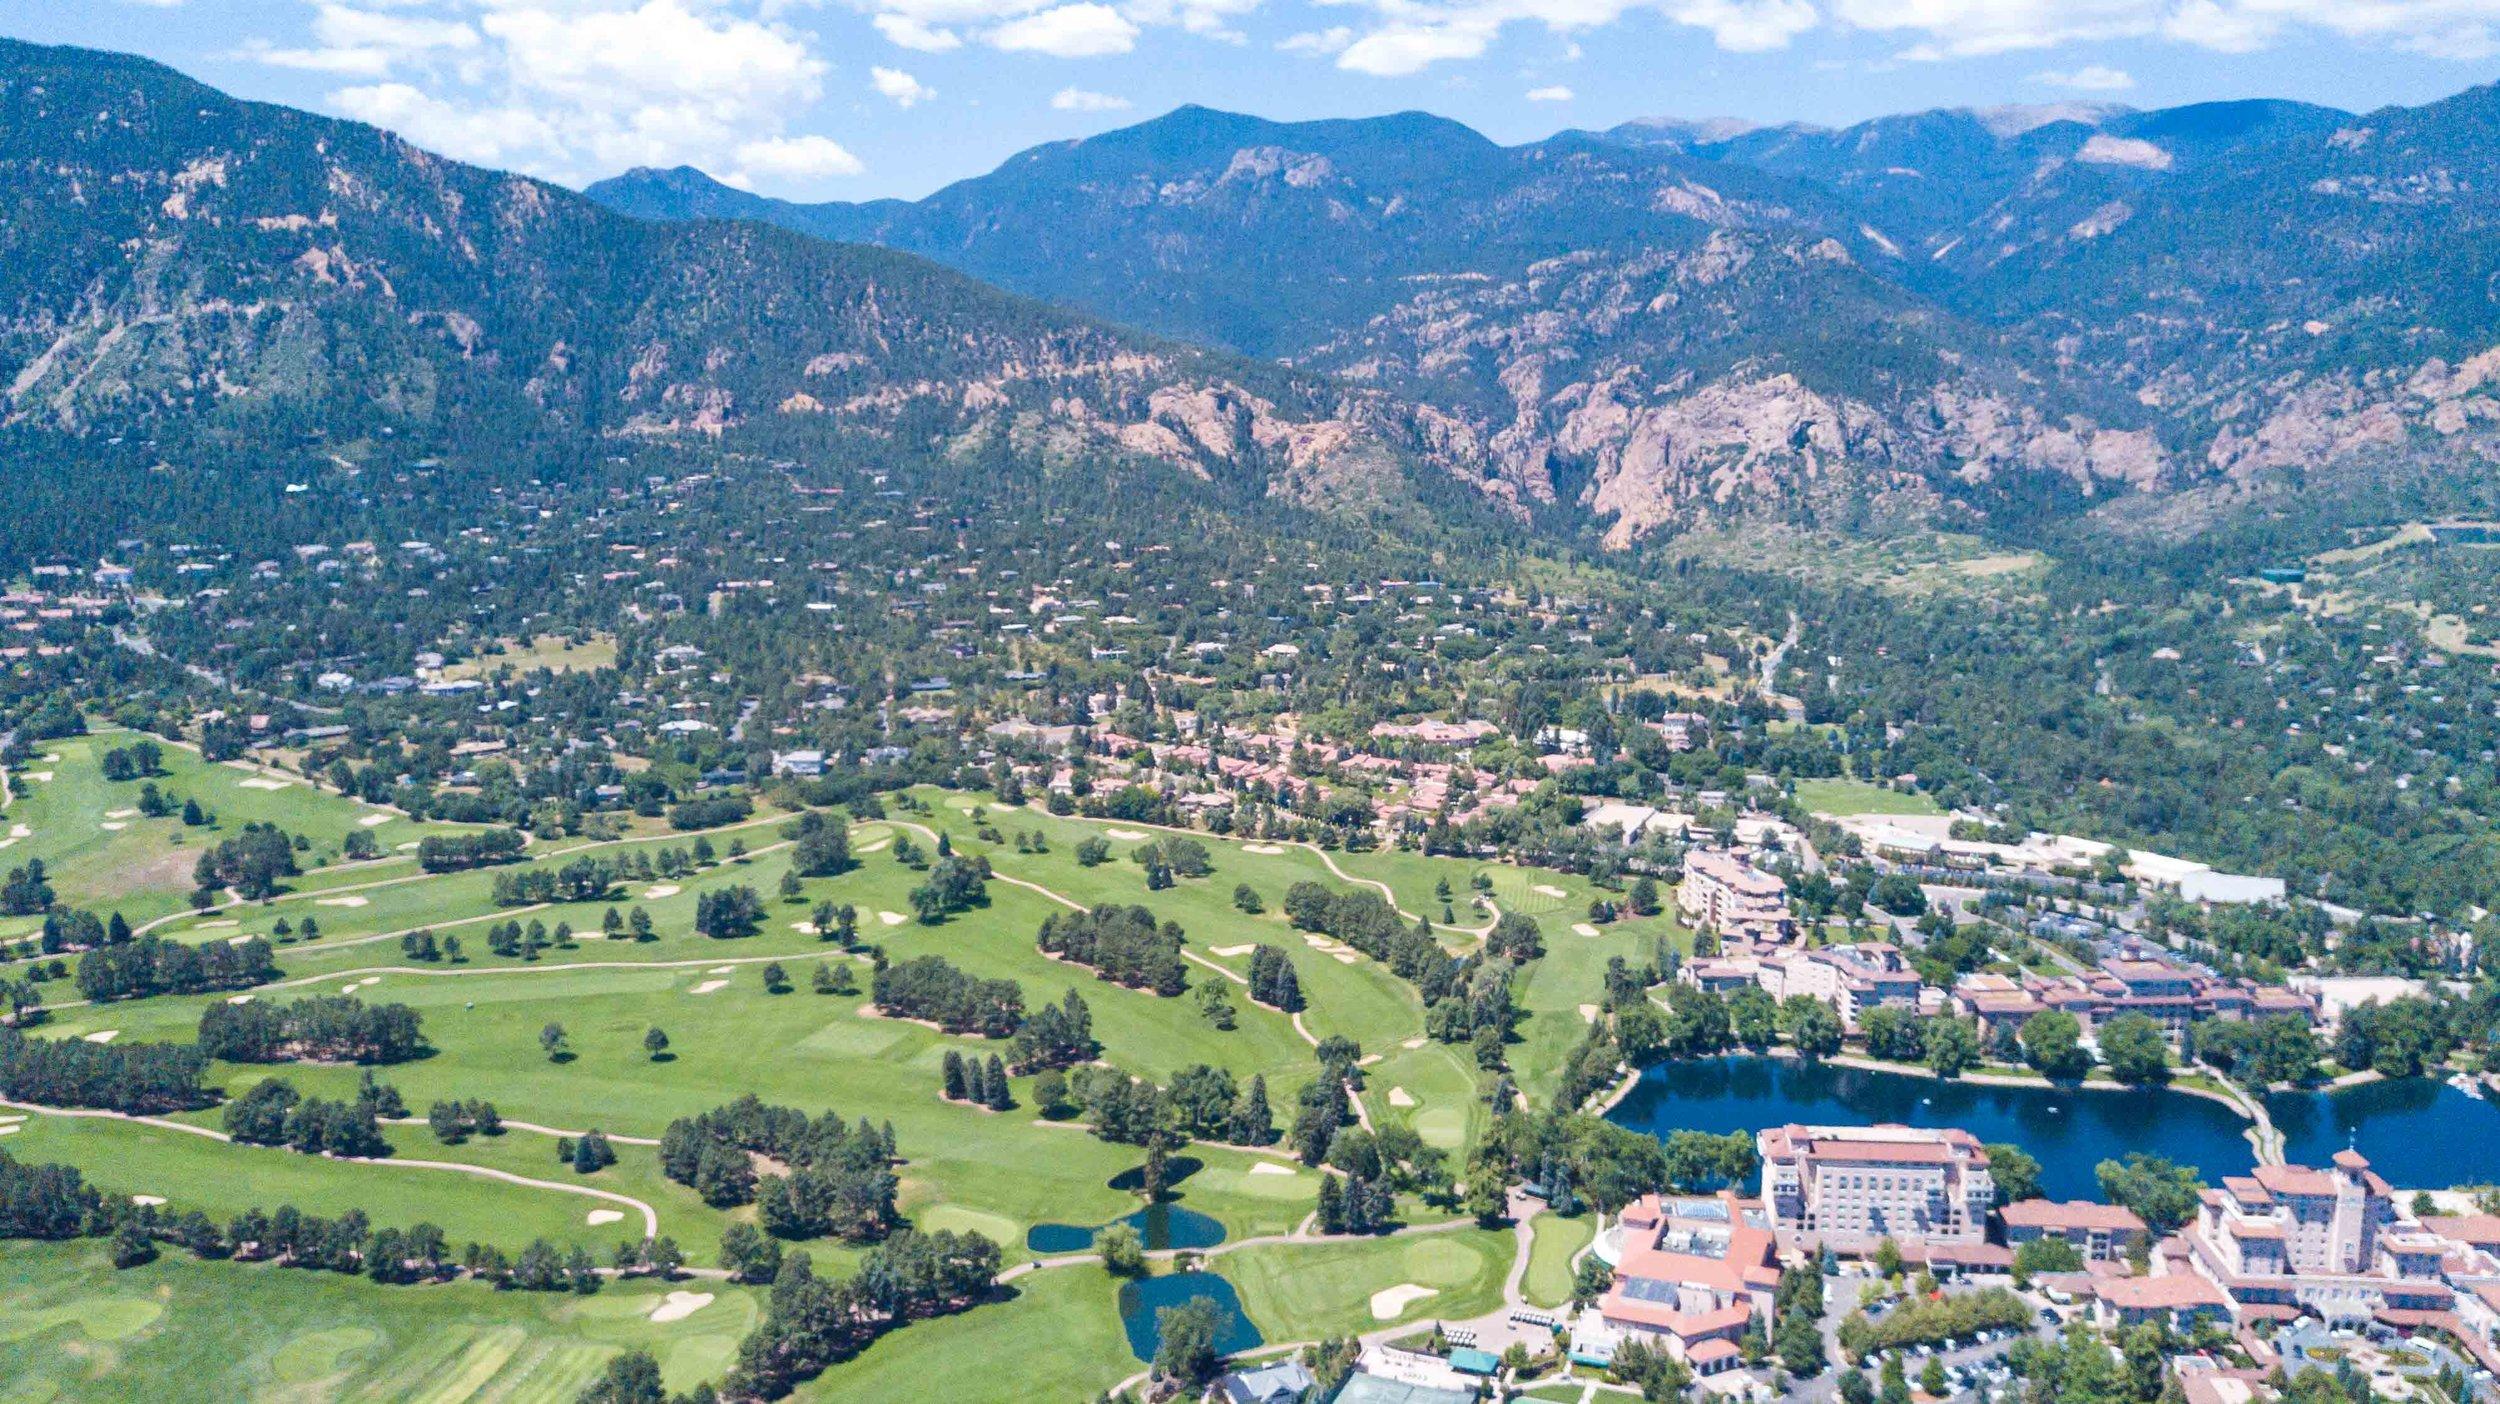 The Broadmoor1-27.jpg